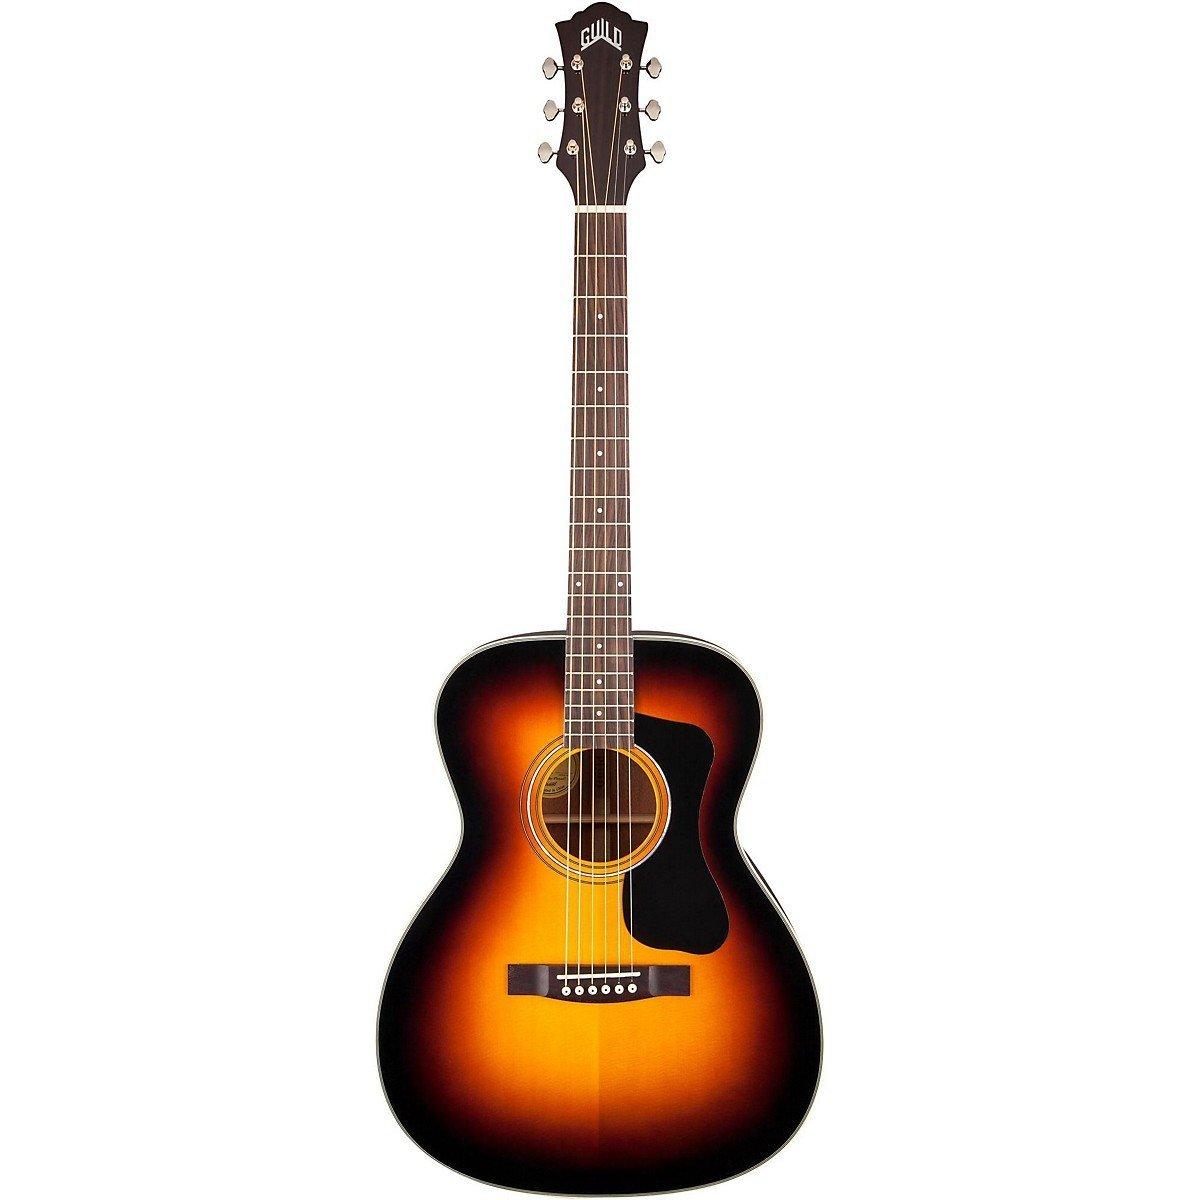 Amazoncom Guild GAD F130 Orchestra Size Acoustic Guitar